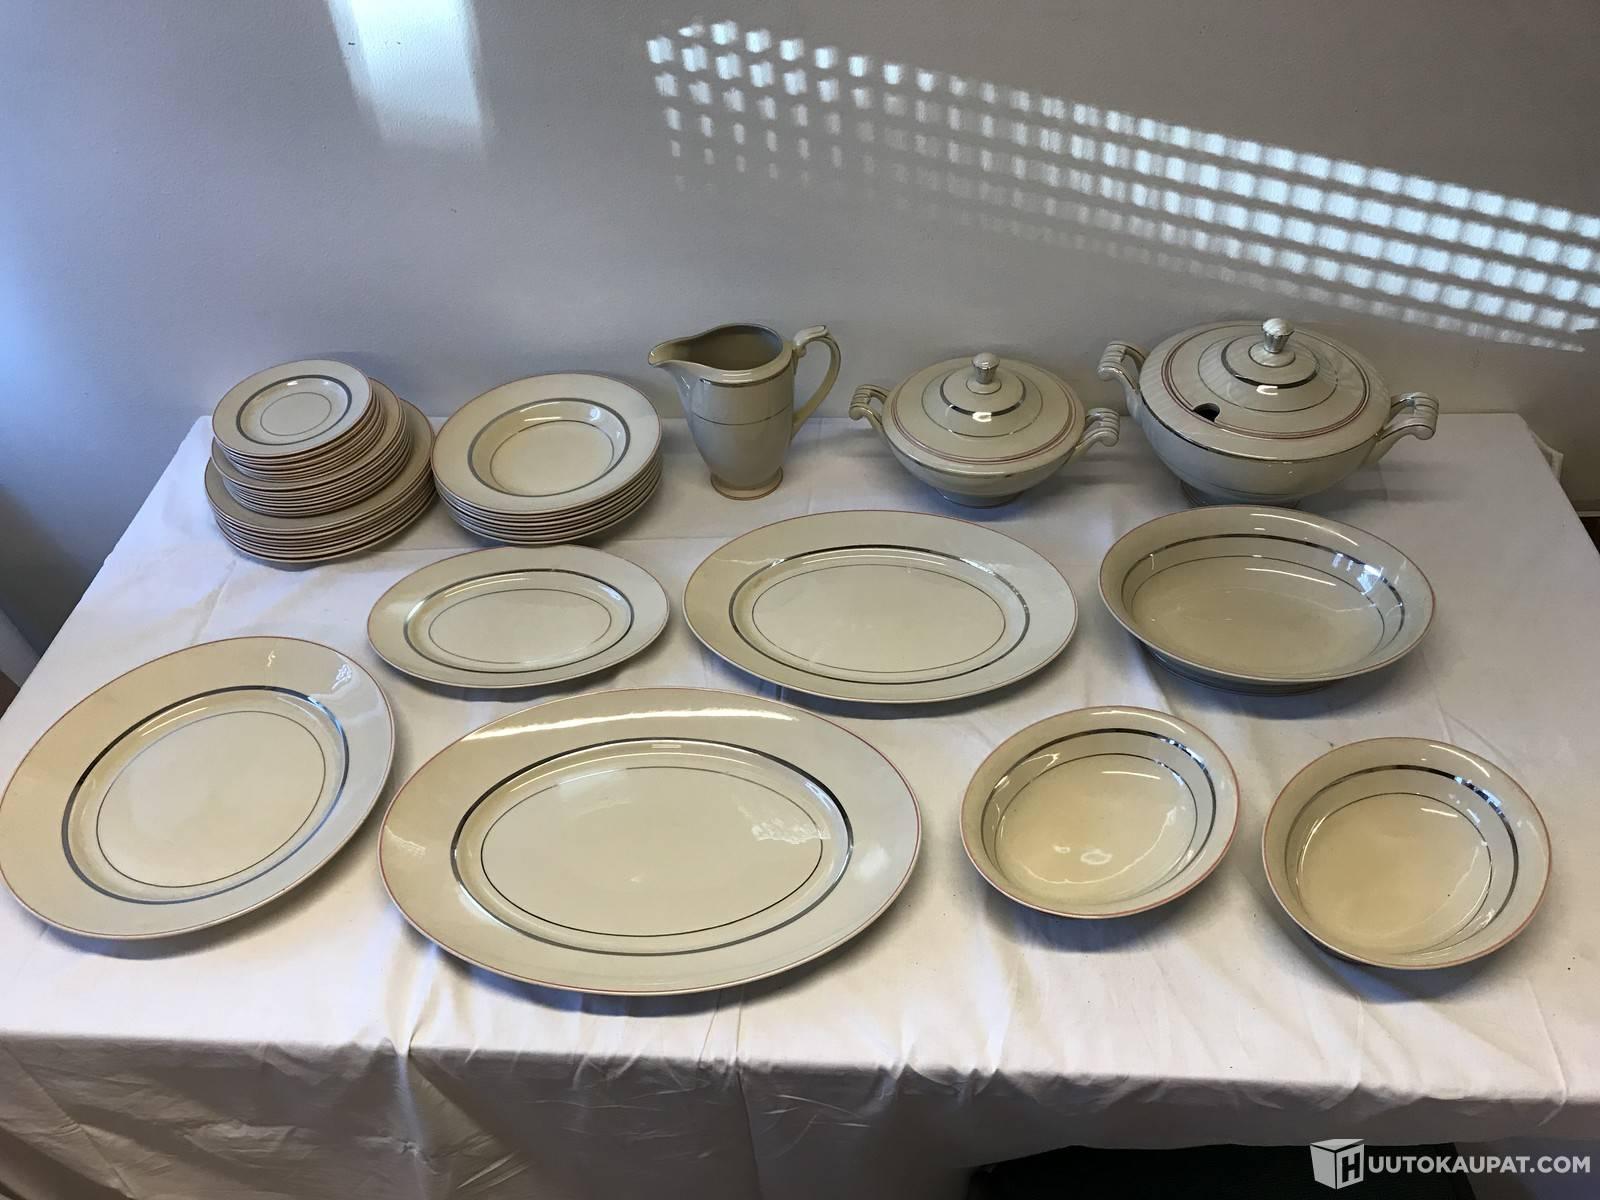 Arabia ruoka astiasto 48 osaa 45a32821d3